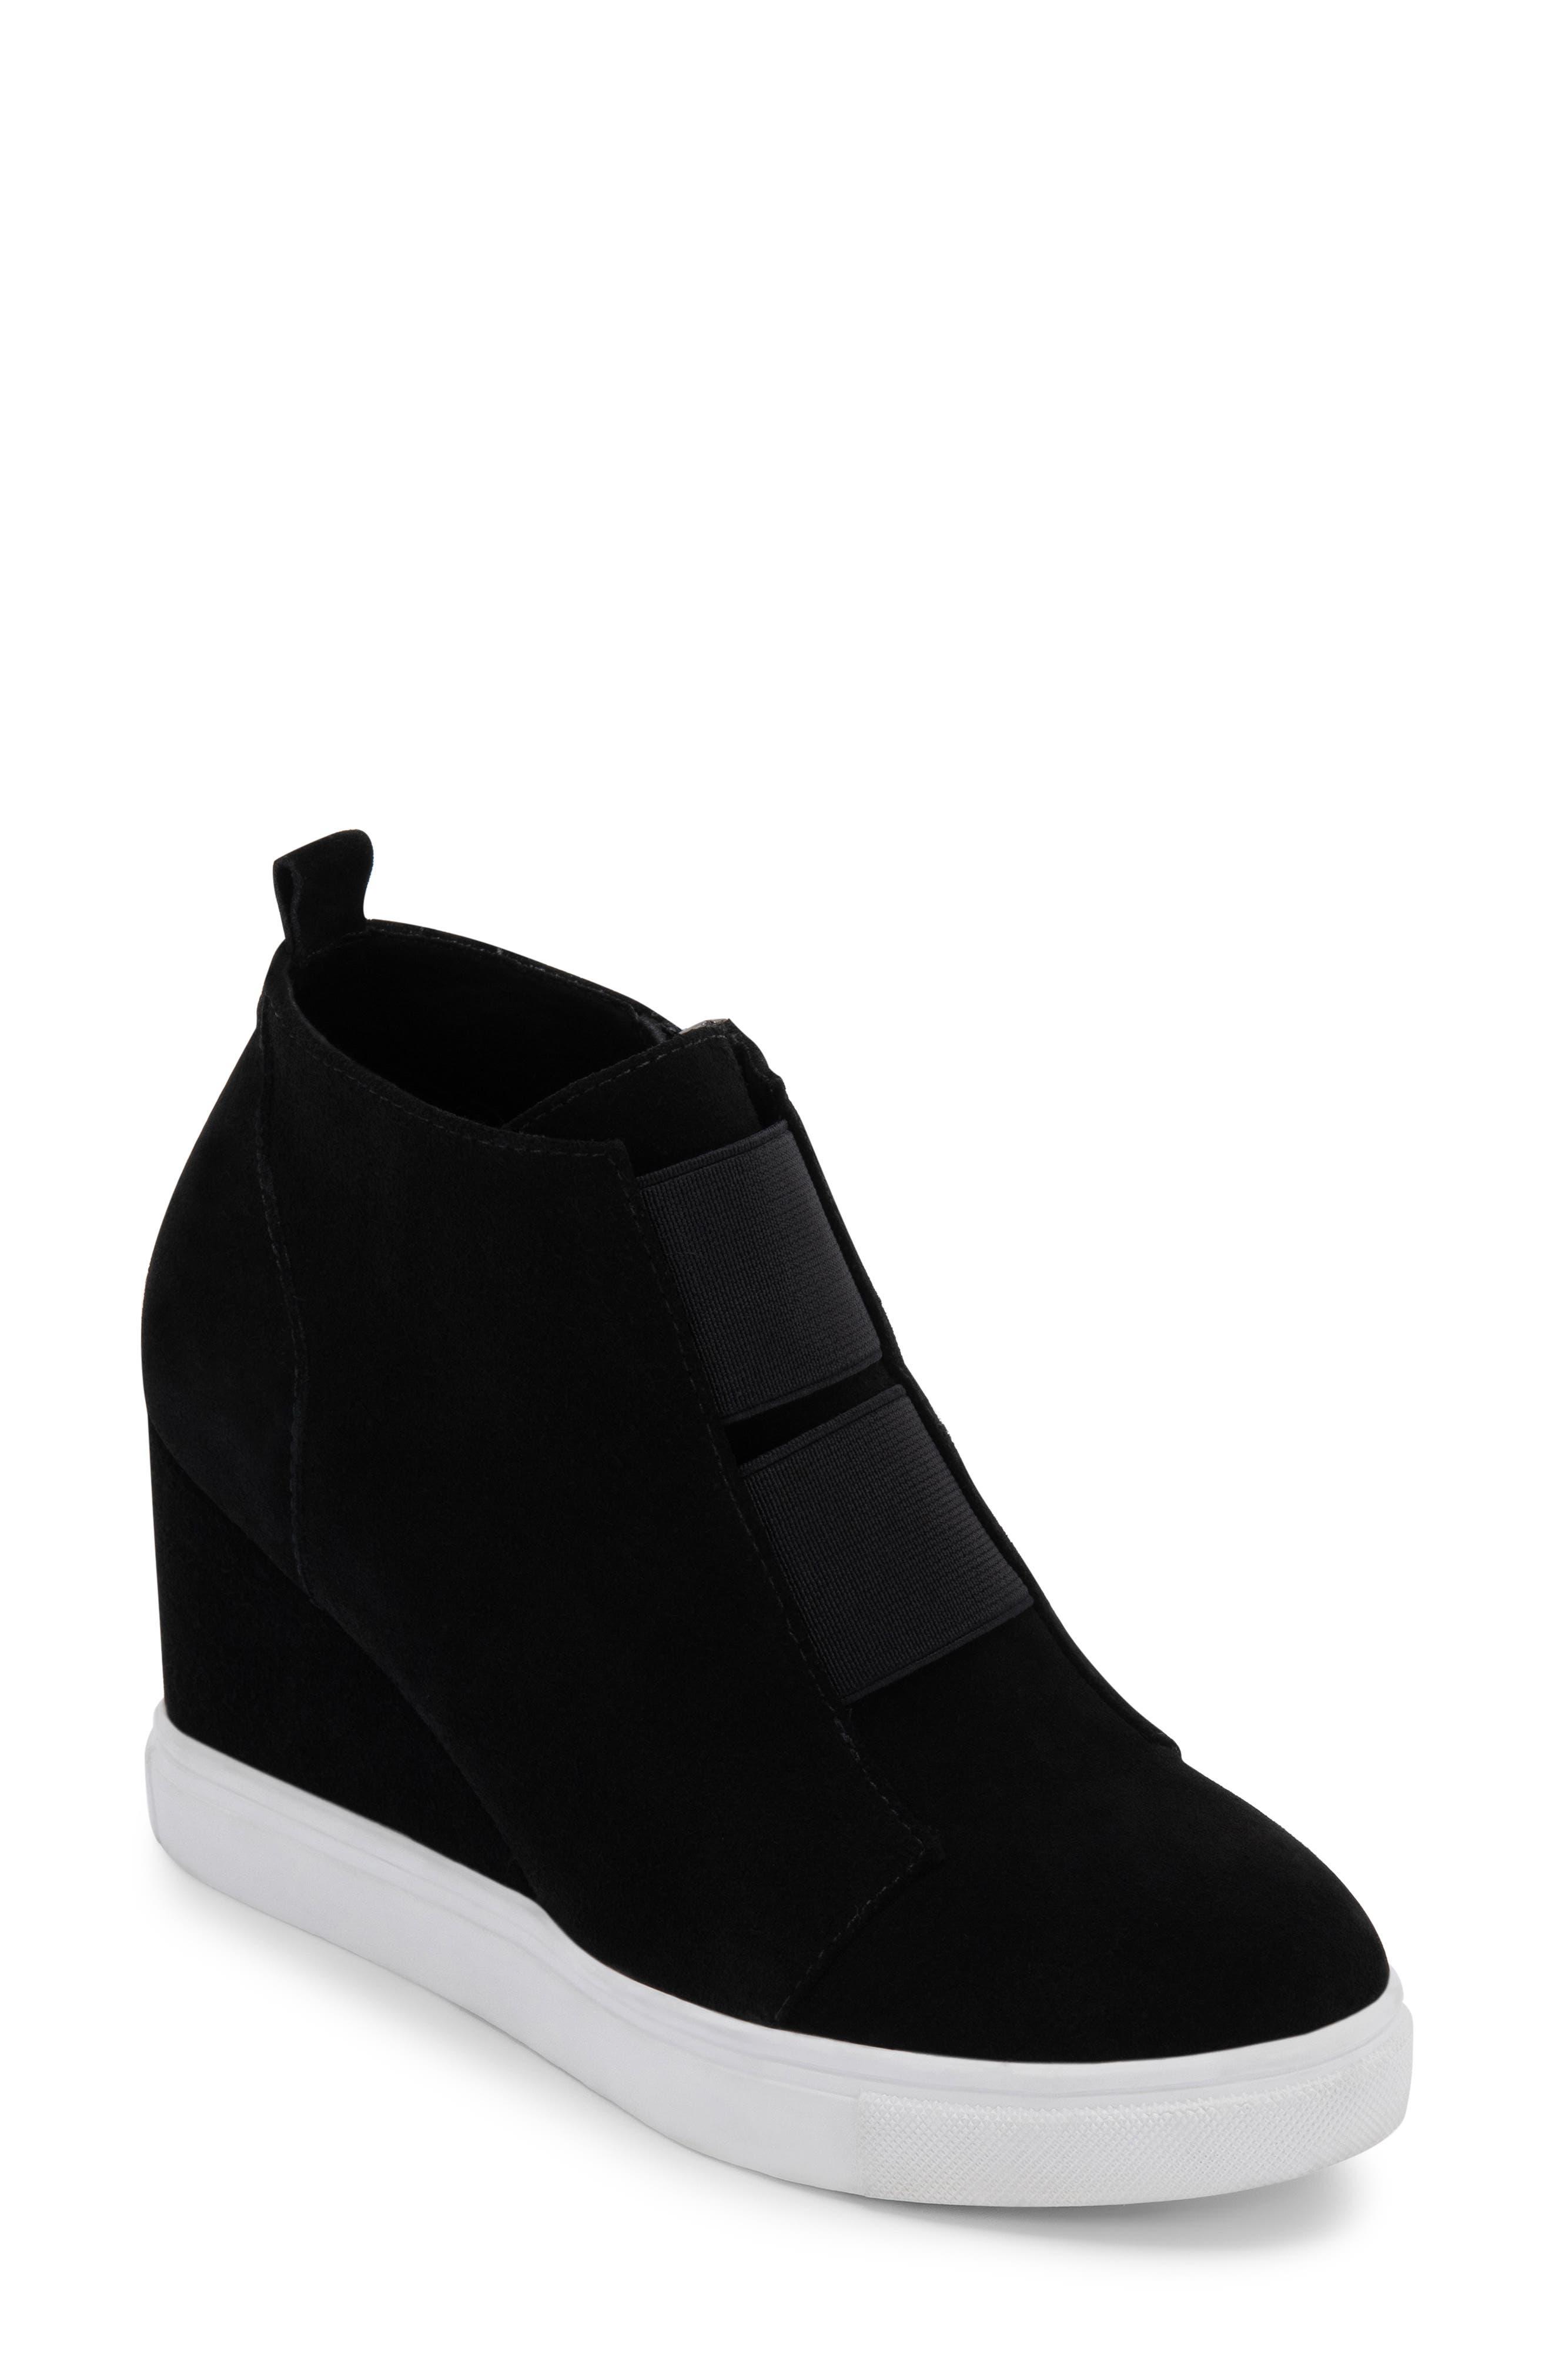 Image of Blondo Gizella Waterproof Suede Hidden Wedge Sneaker